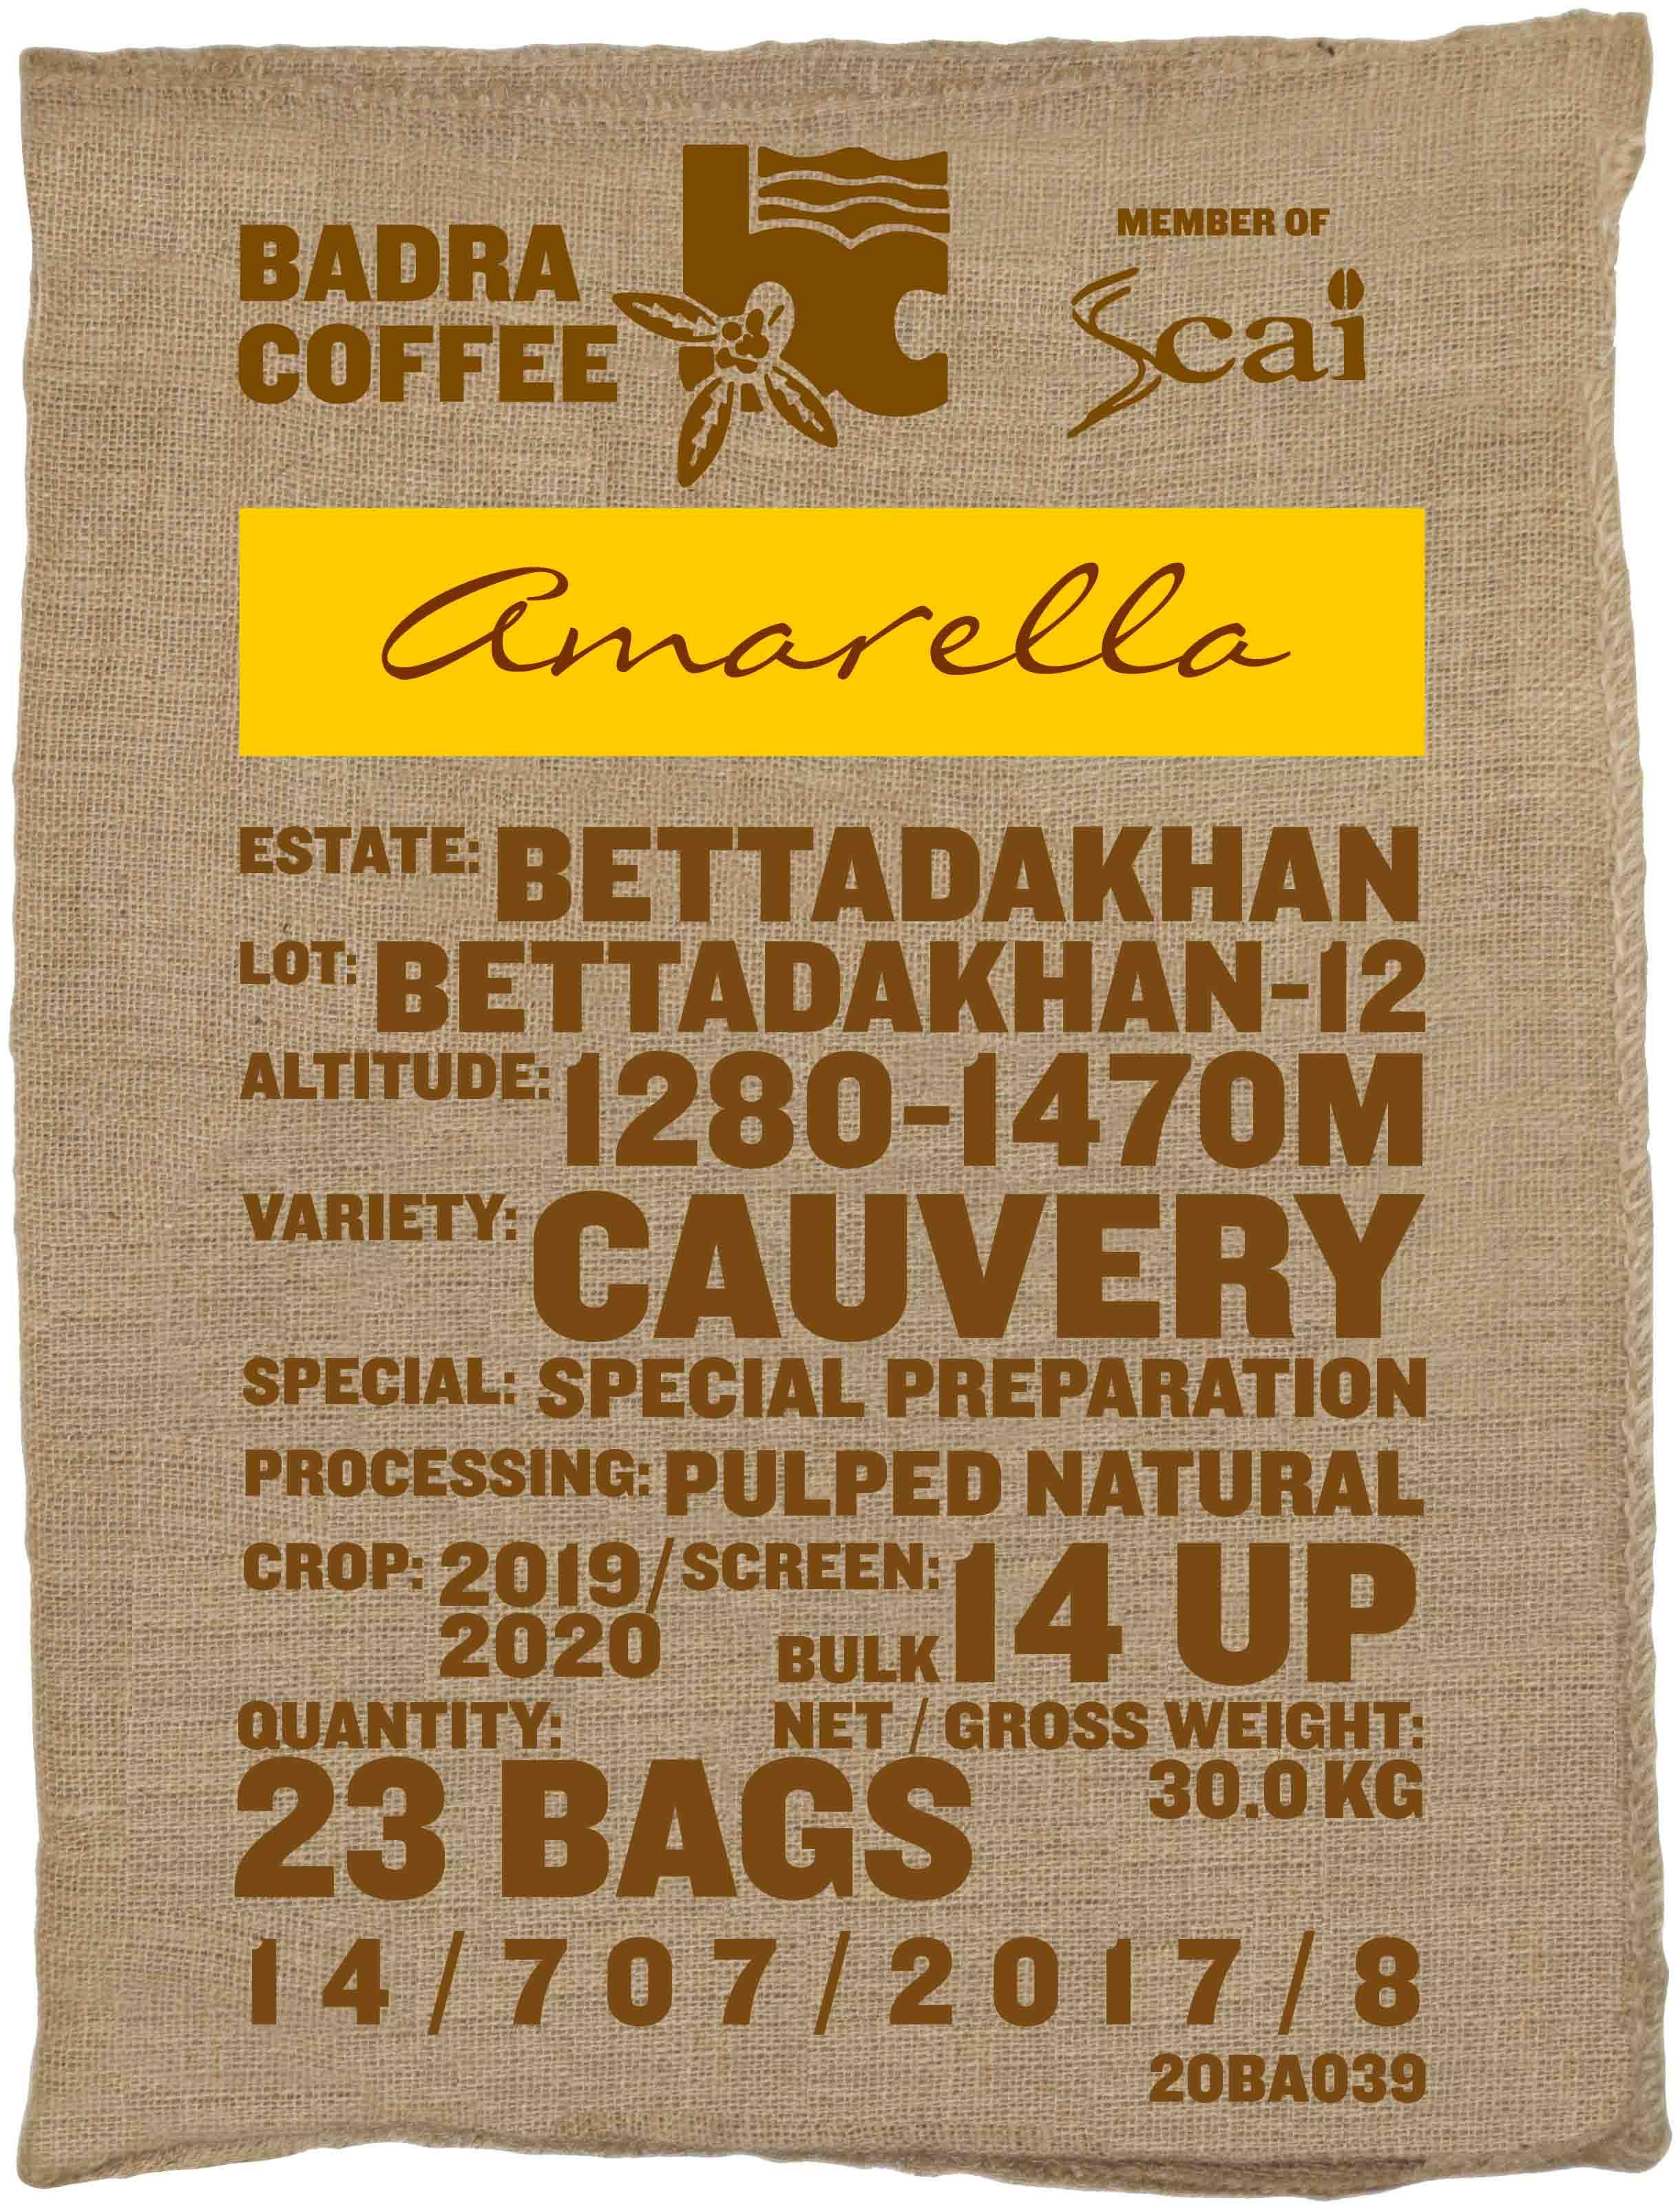 Ein Rohkaffeesack amarella Parzellenkaffee Varietät Cauvery. Badra Estates Lot Bettadakhan 12.